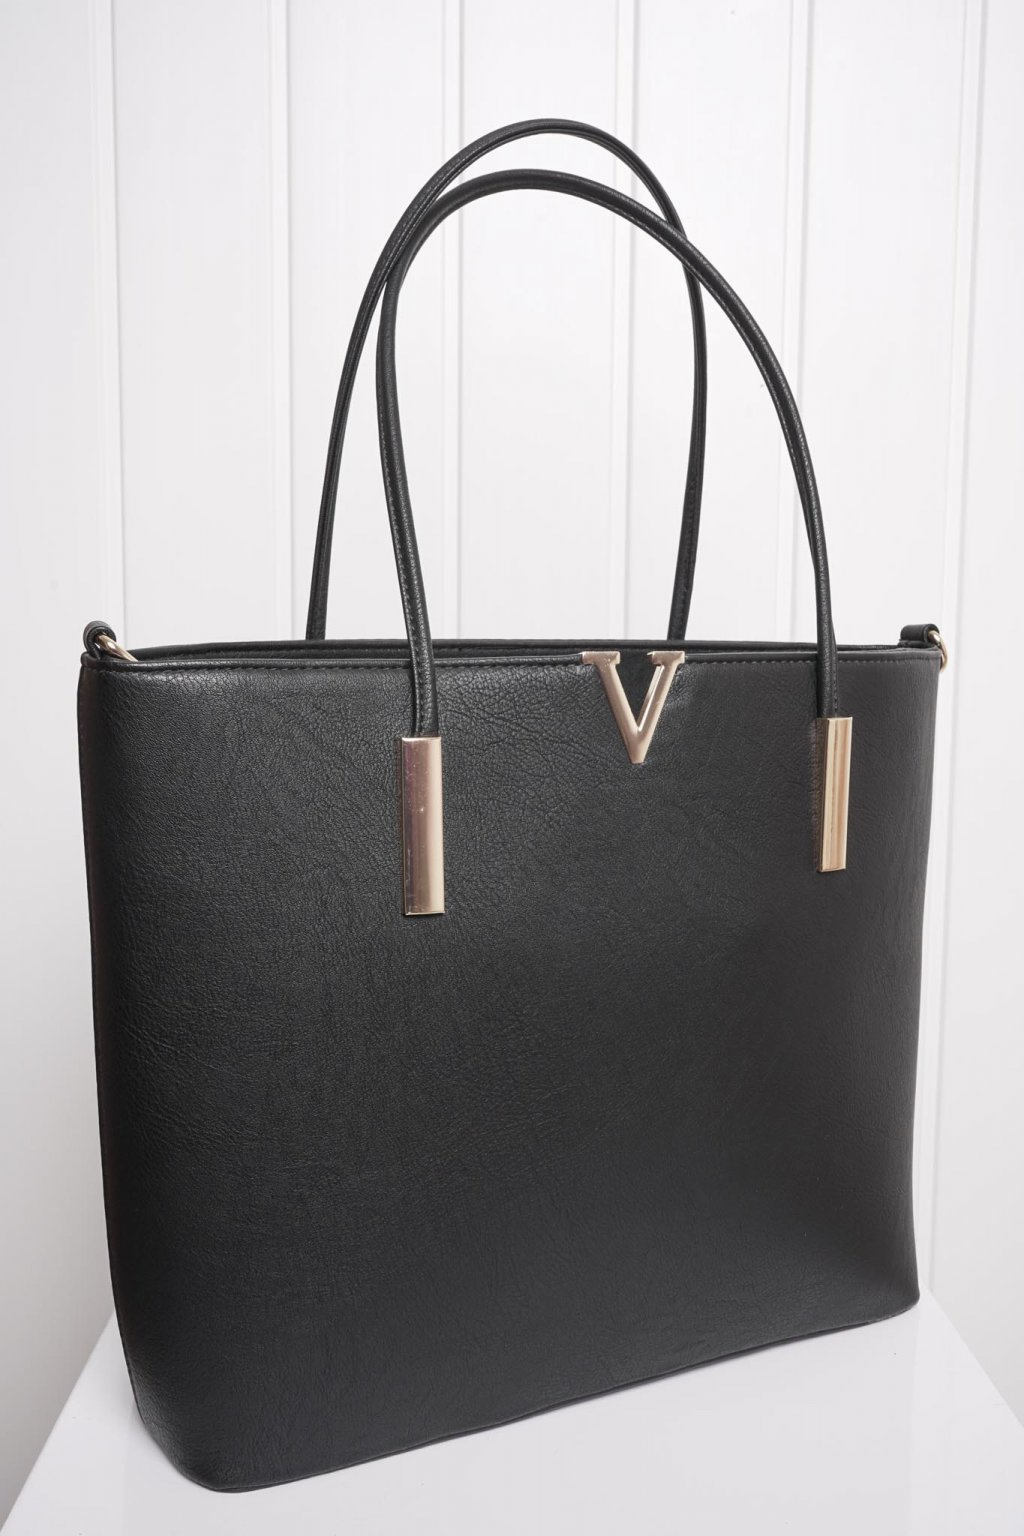 Kabelka, ruksak, dobrá cena, čierna kabelka, čierny ruksak, basic, kabelky, ruksaky 129